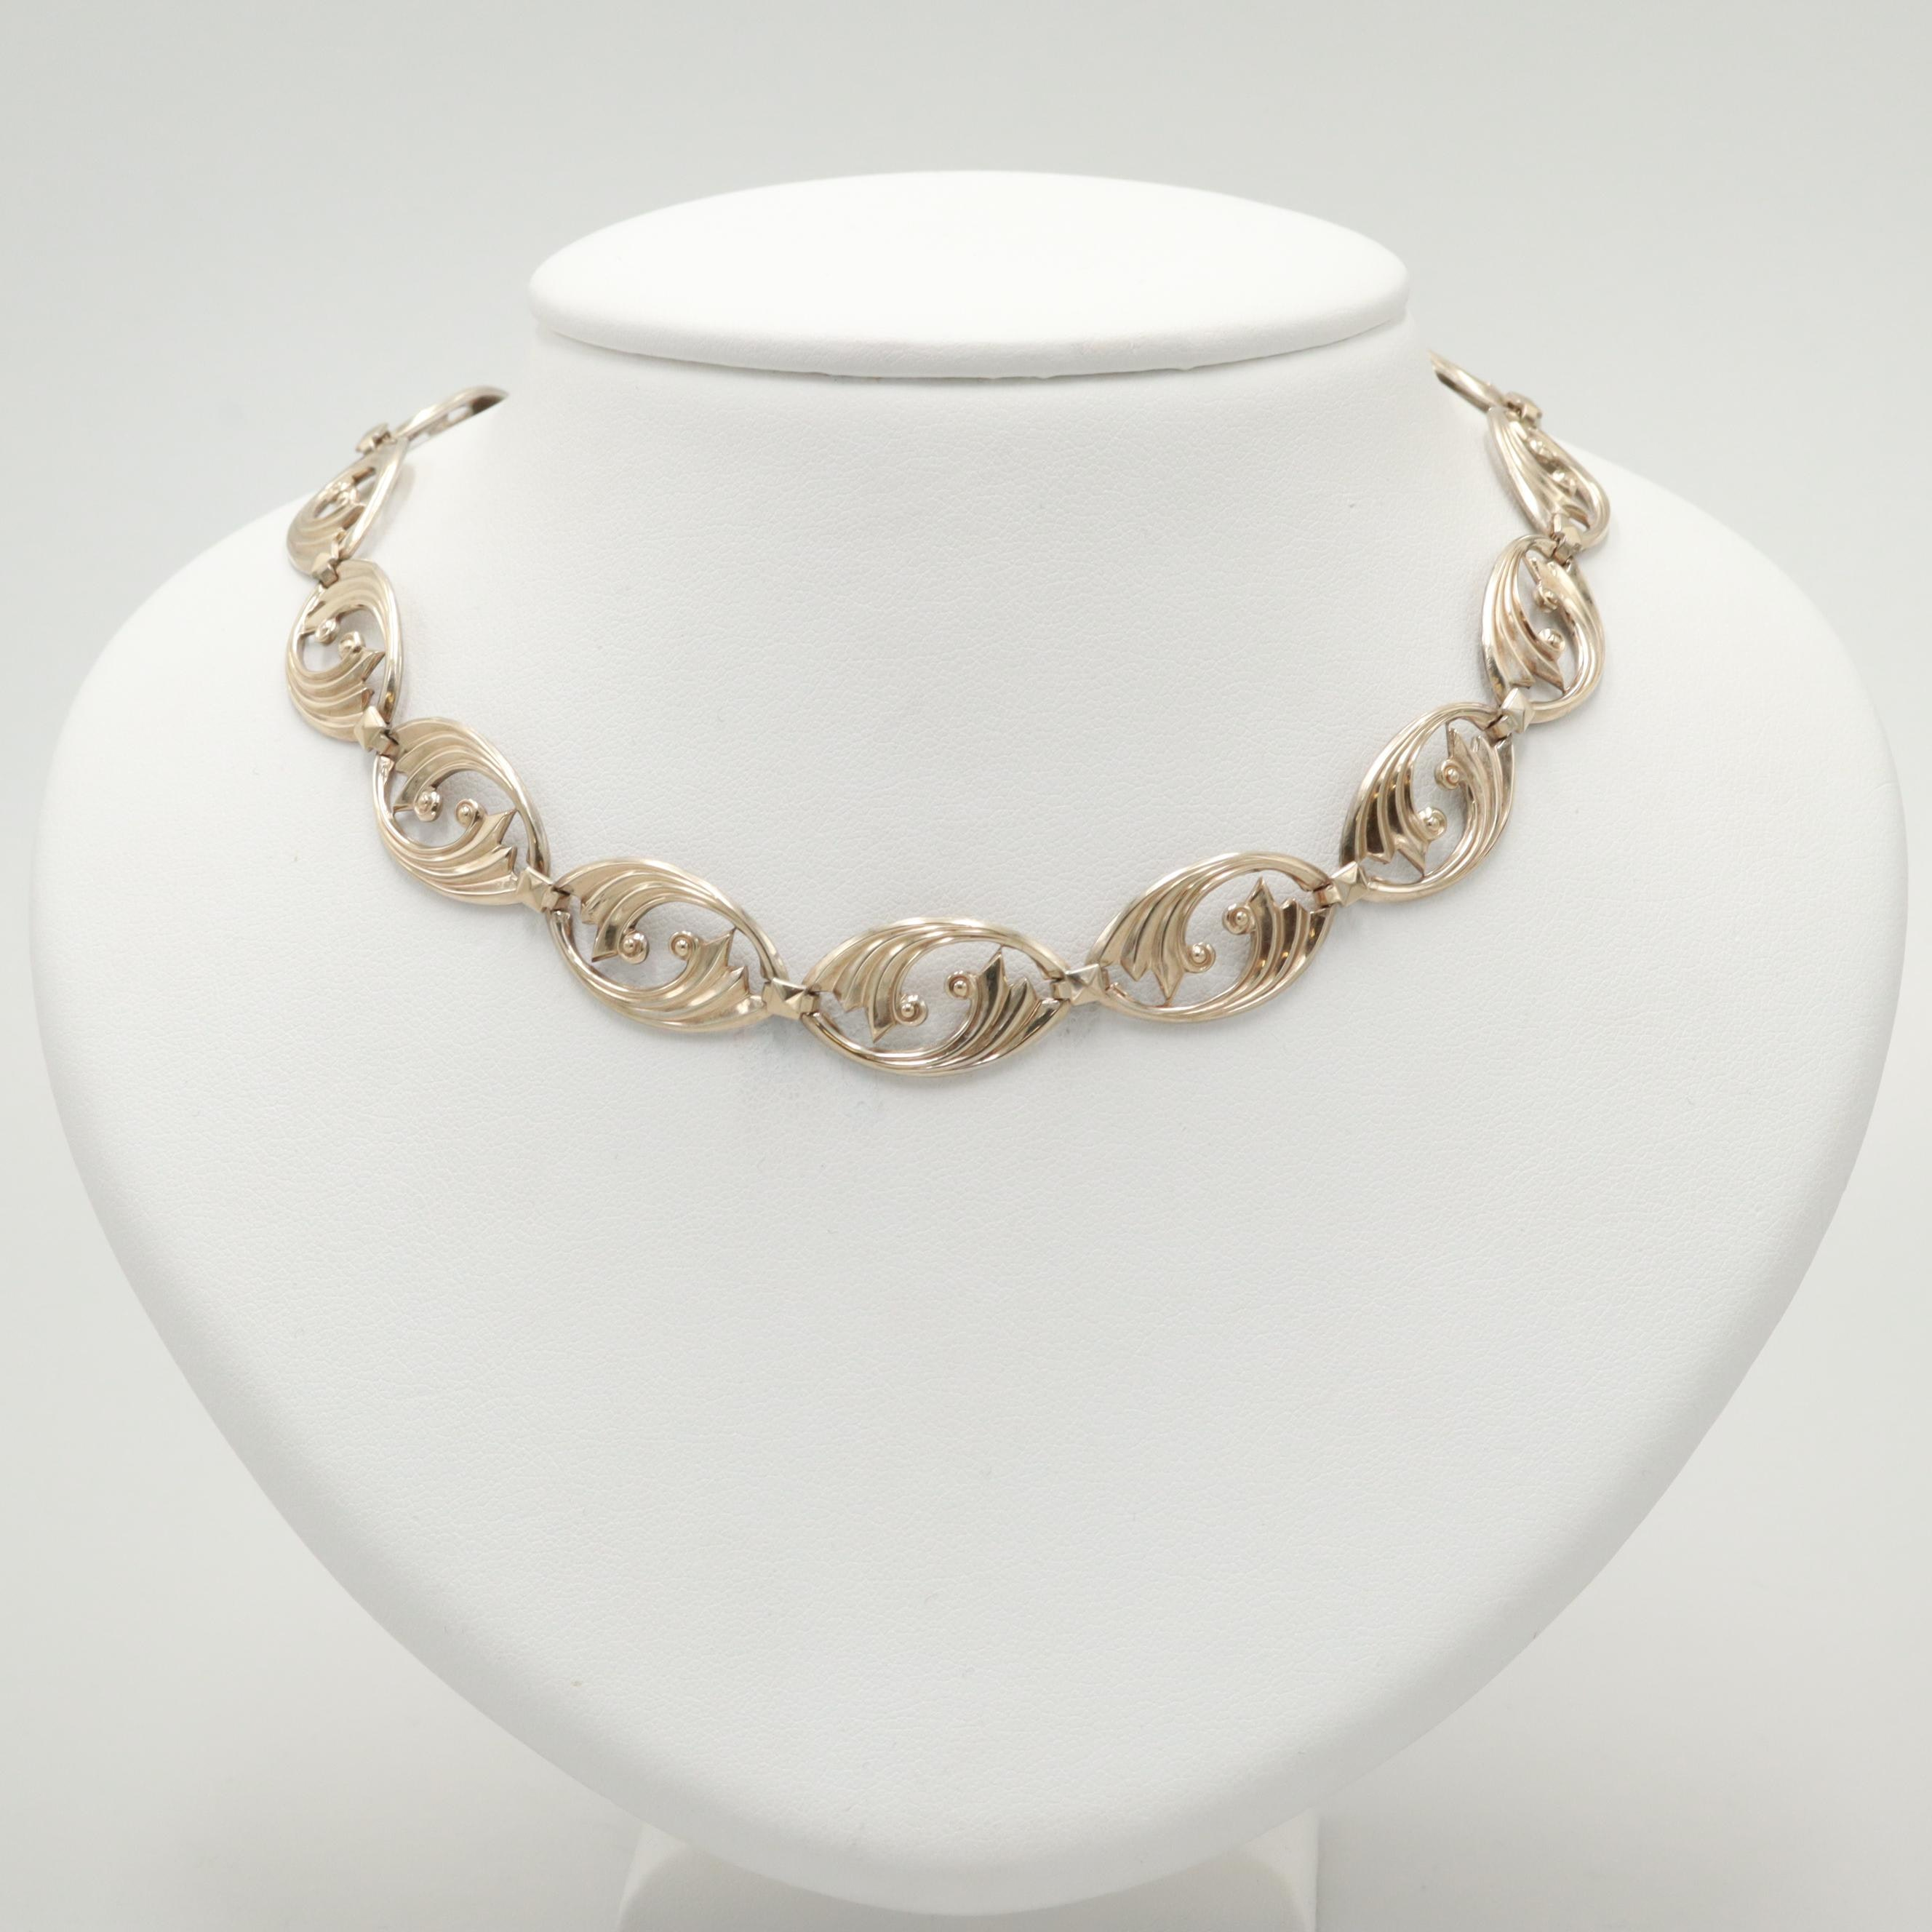 Vintage Symmetalic Gold Wash on Sterling Silver Necklace